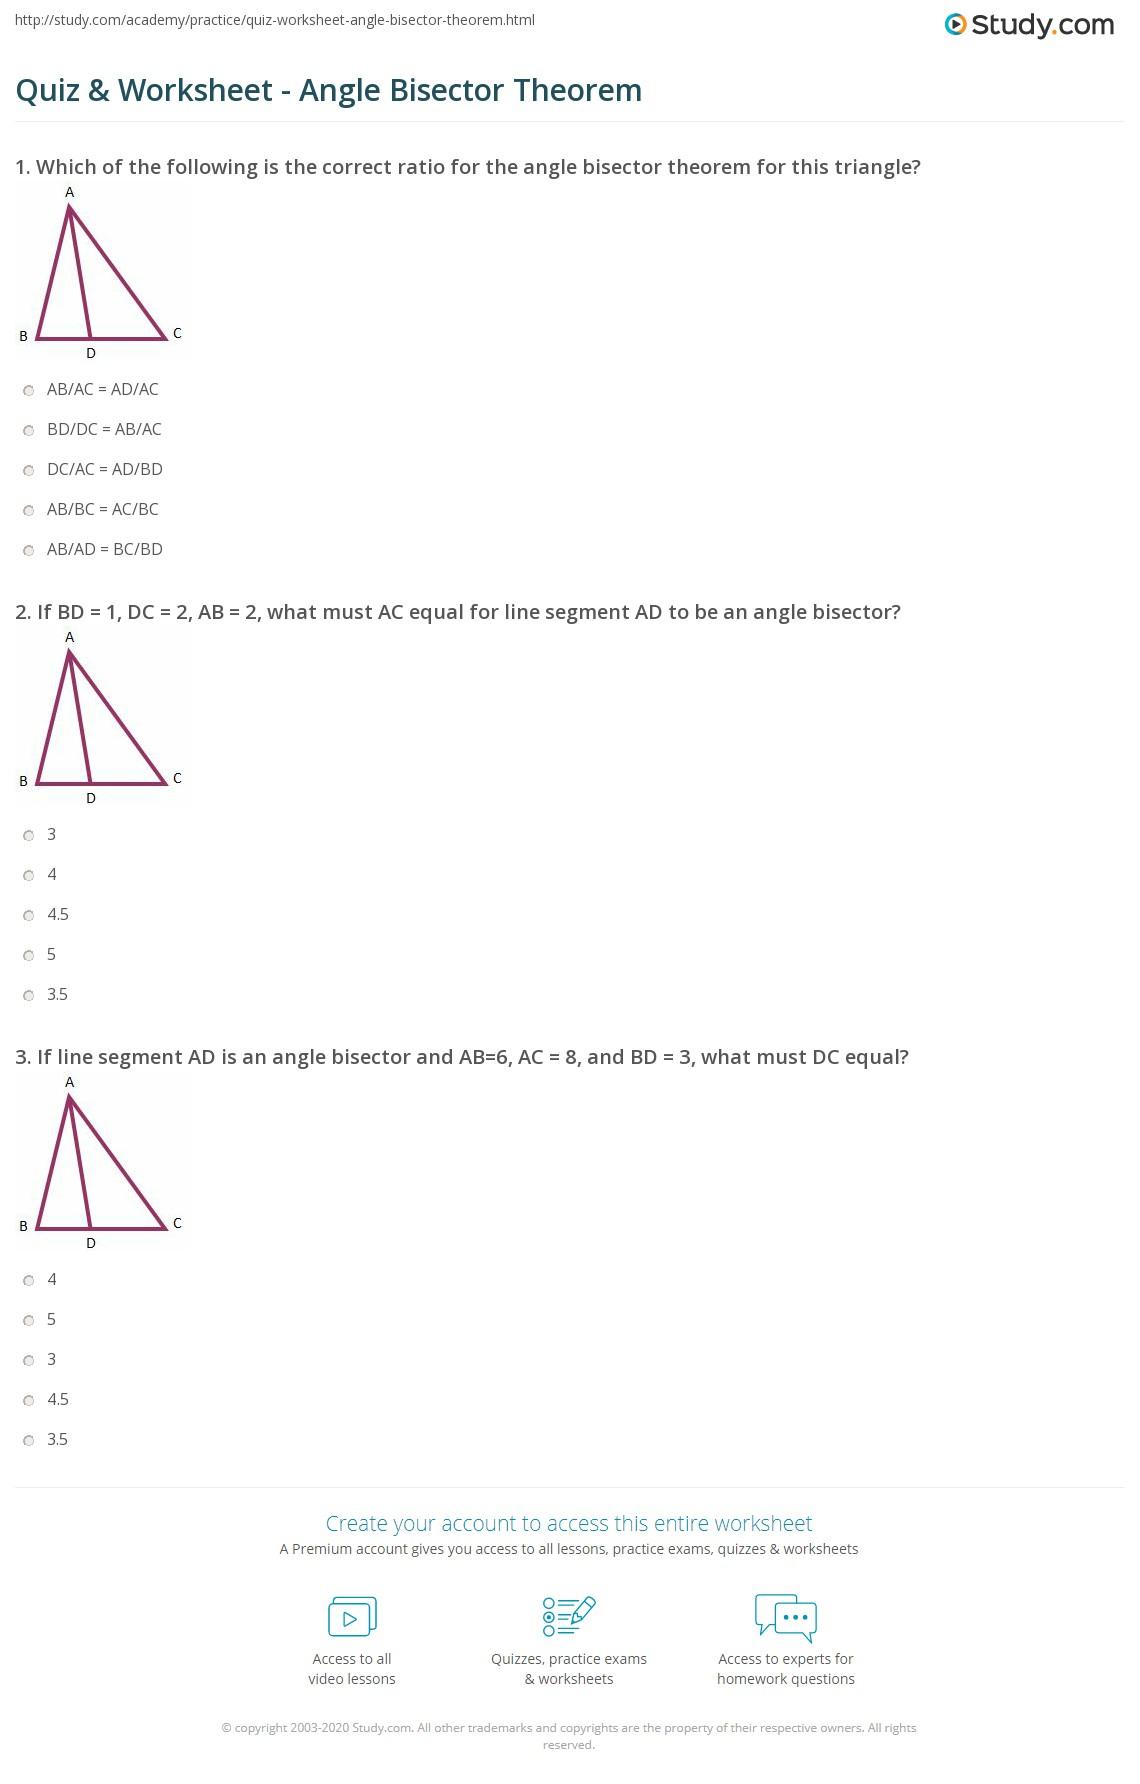 hight resolution of Quiz \u0026 Worksheet - Angle Bisector Theorem   Study.com